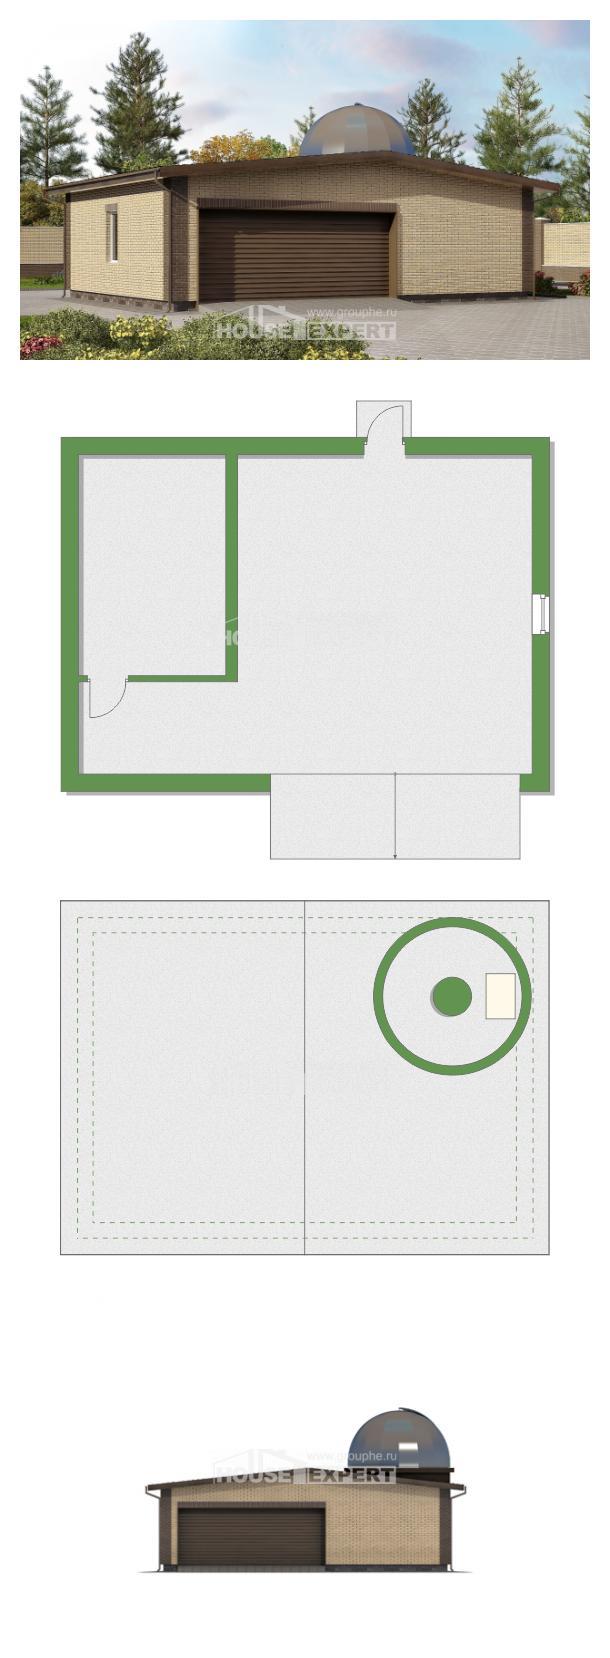 Проект дома 075-001-Л | House Expert